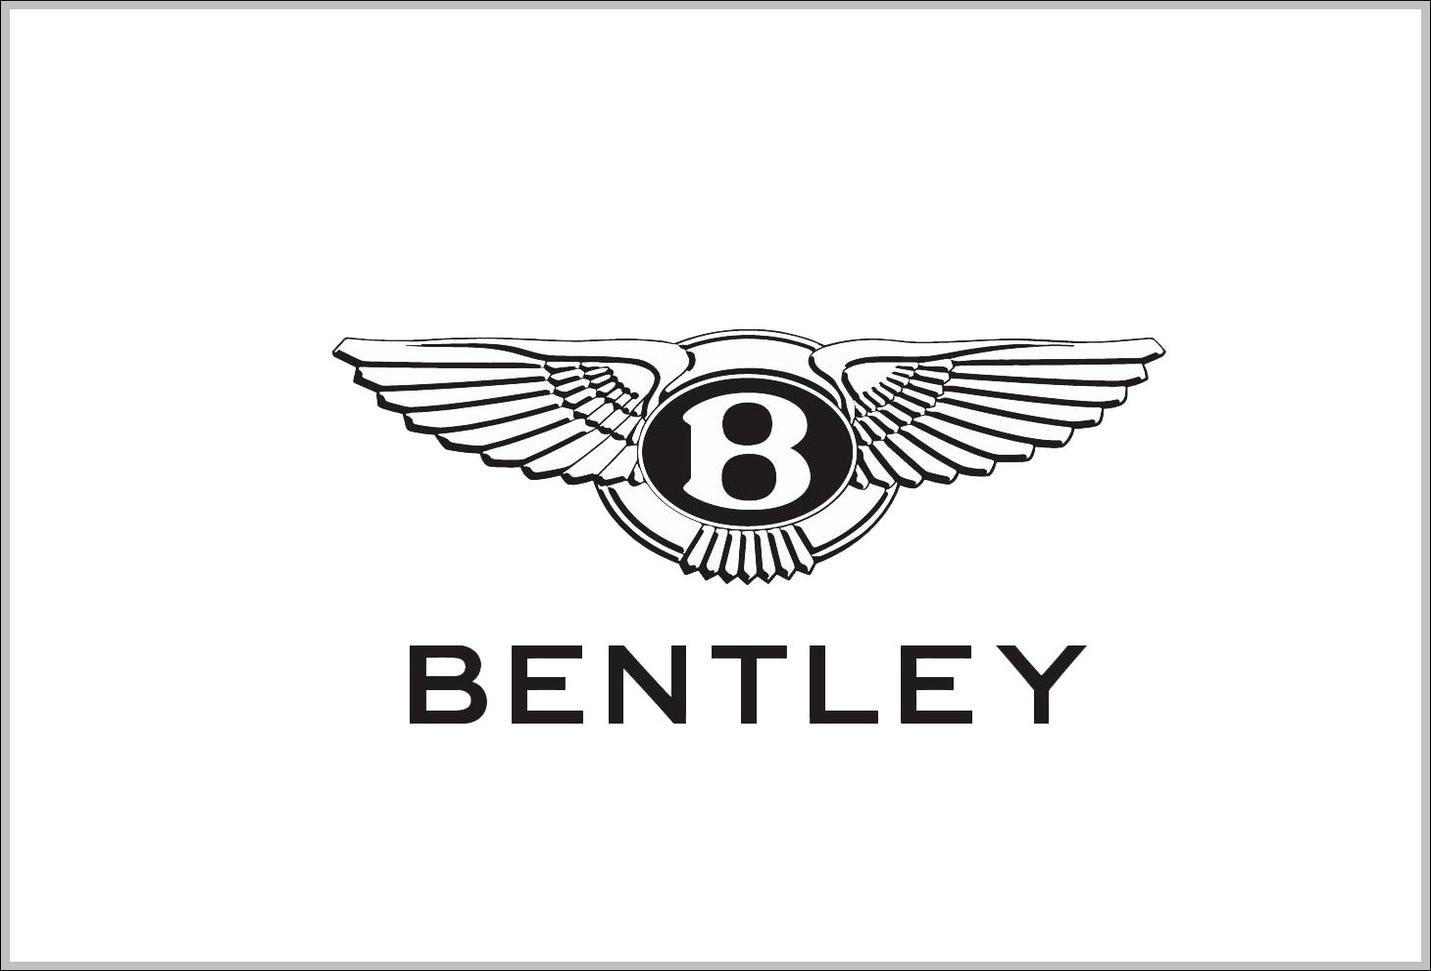 Bentley Brand Logo Sign